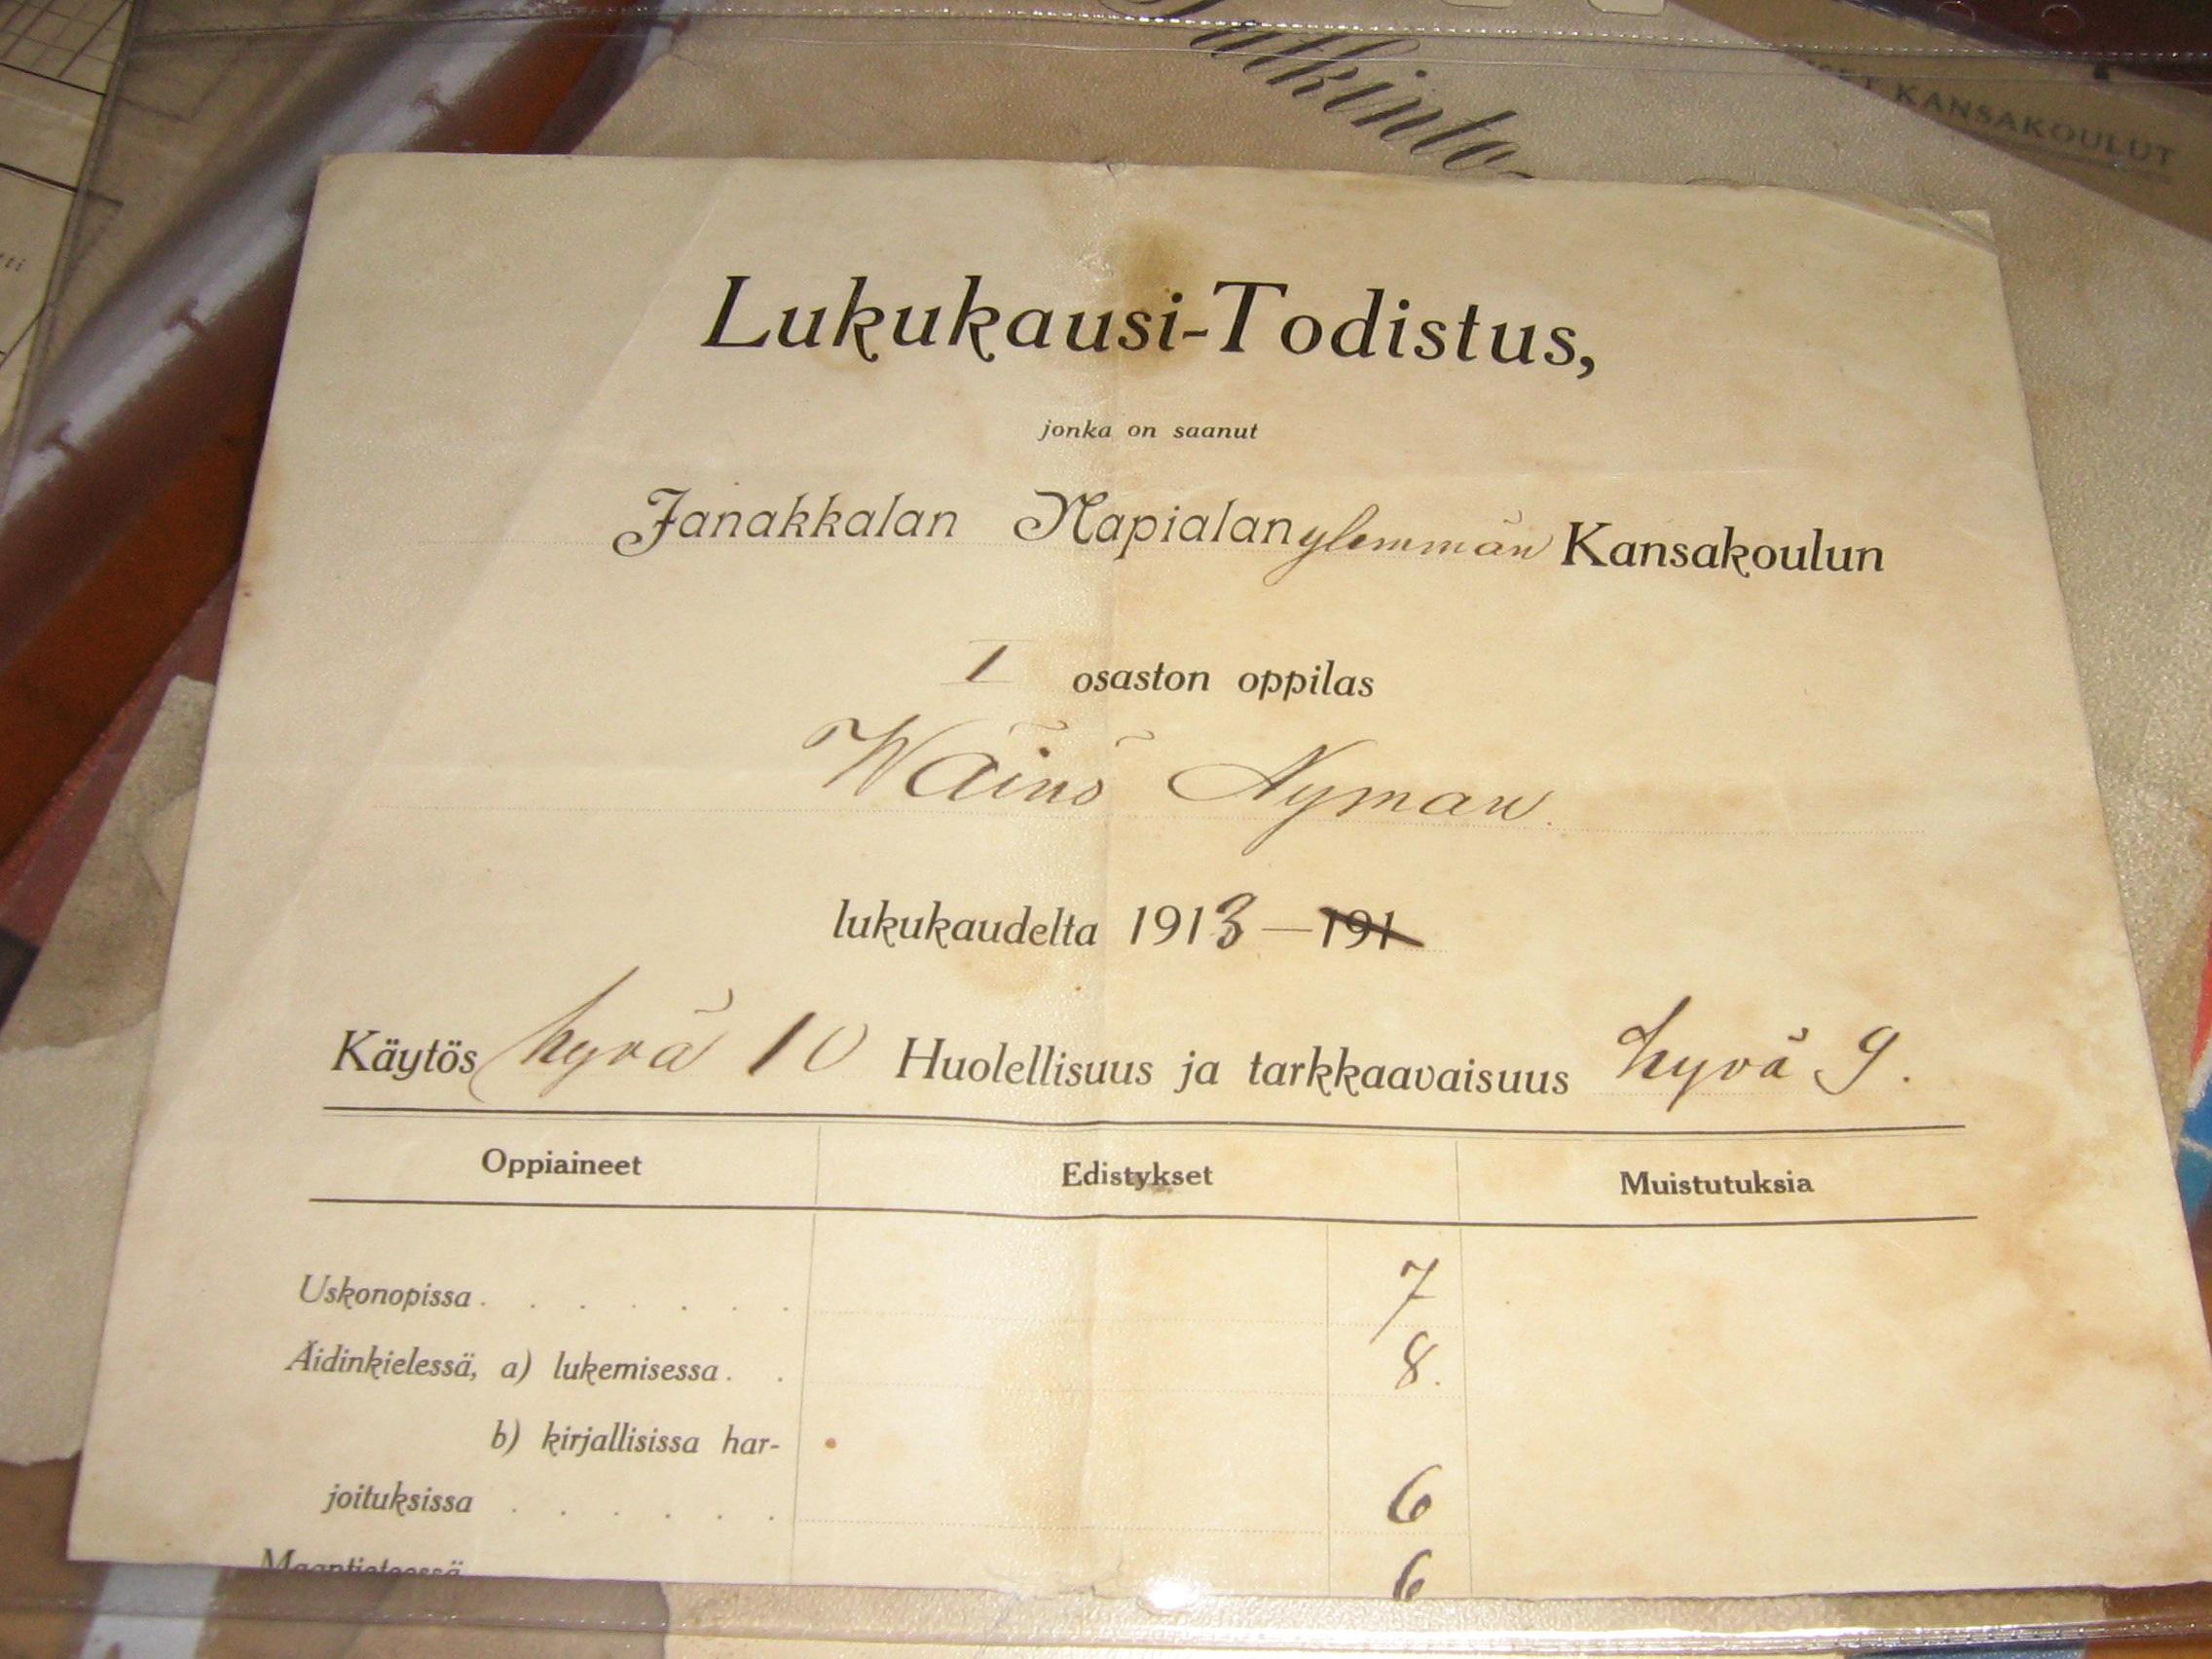 Wäinö Nymannin todistus 1913